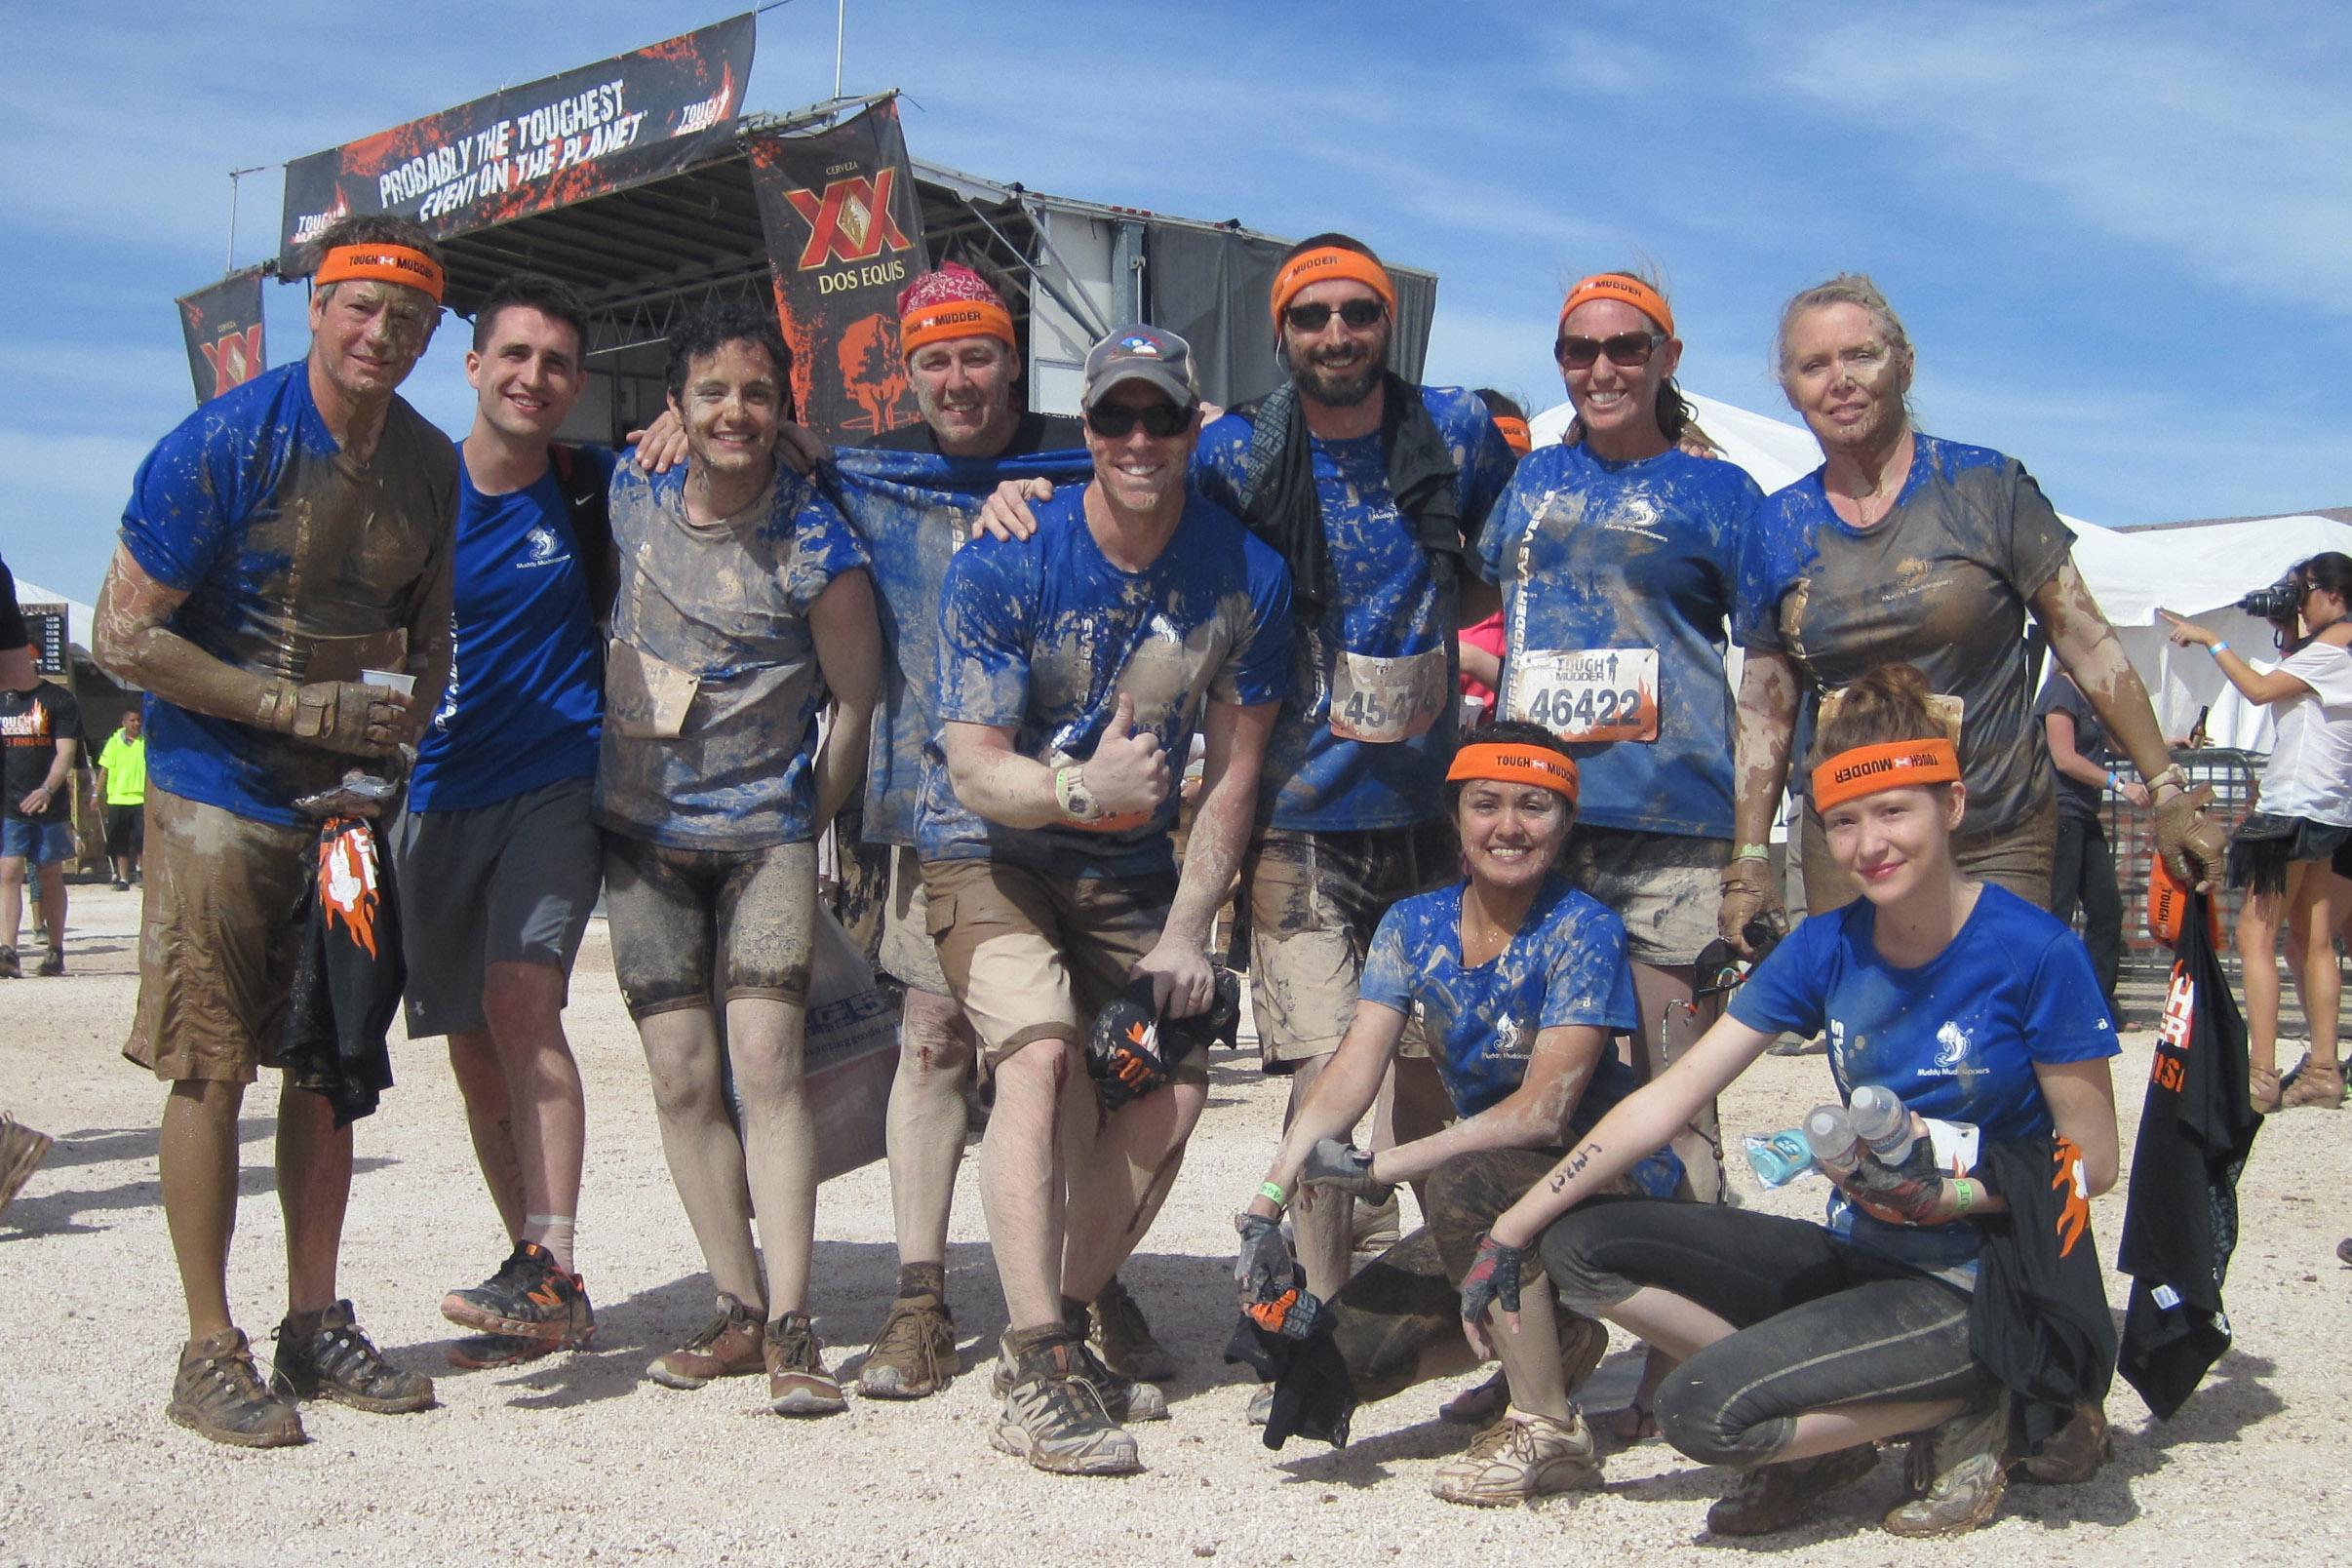 Design your own t shirt las vegas - Muddy Mudskippers Finish Tough Mudder Vegas T Shirt Photo